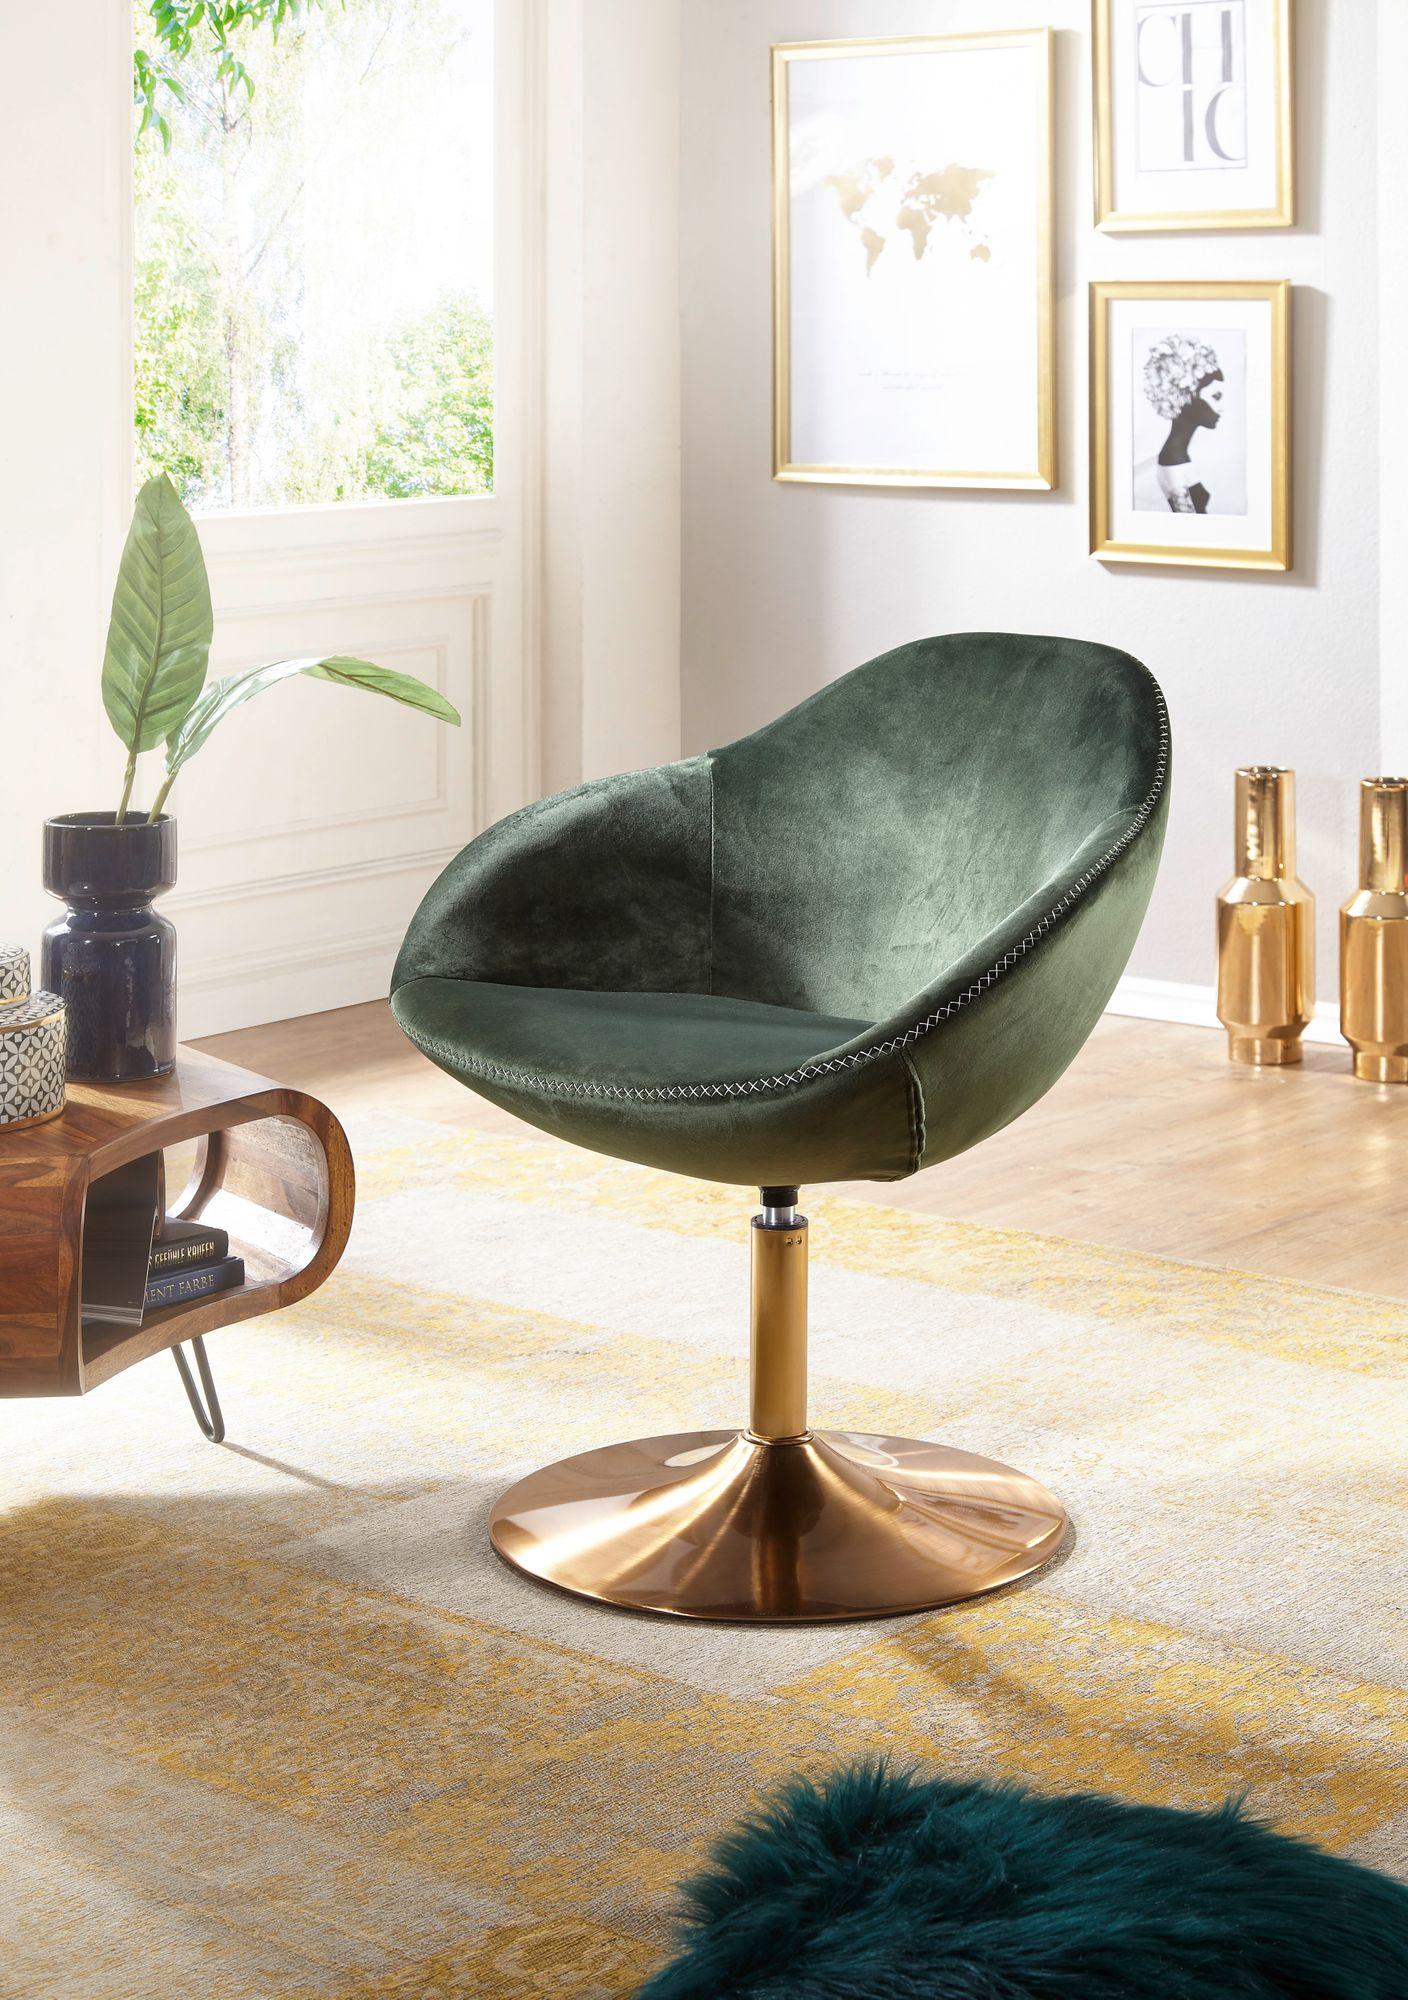 Wohnling Loungesessel Sarin Samt Grun Gold 70x79x70 Cm Design Drehstuhl Clubsessel Polsterstuhl Mit Armlehne